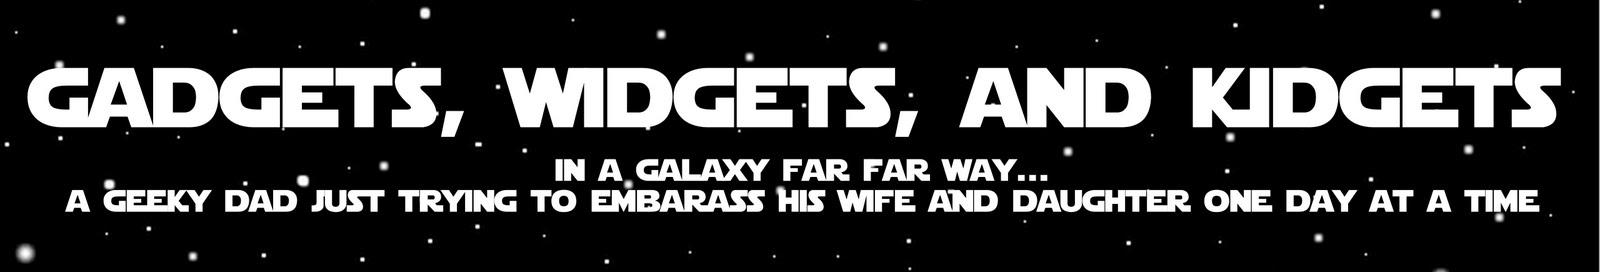 Gadgets, Widgets, and Kidgets